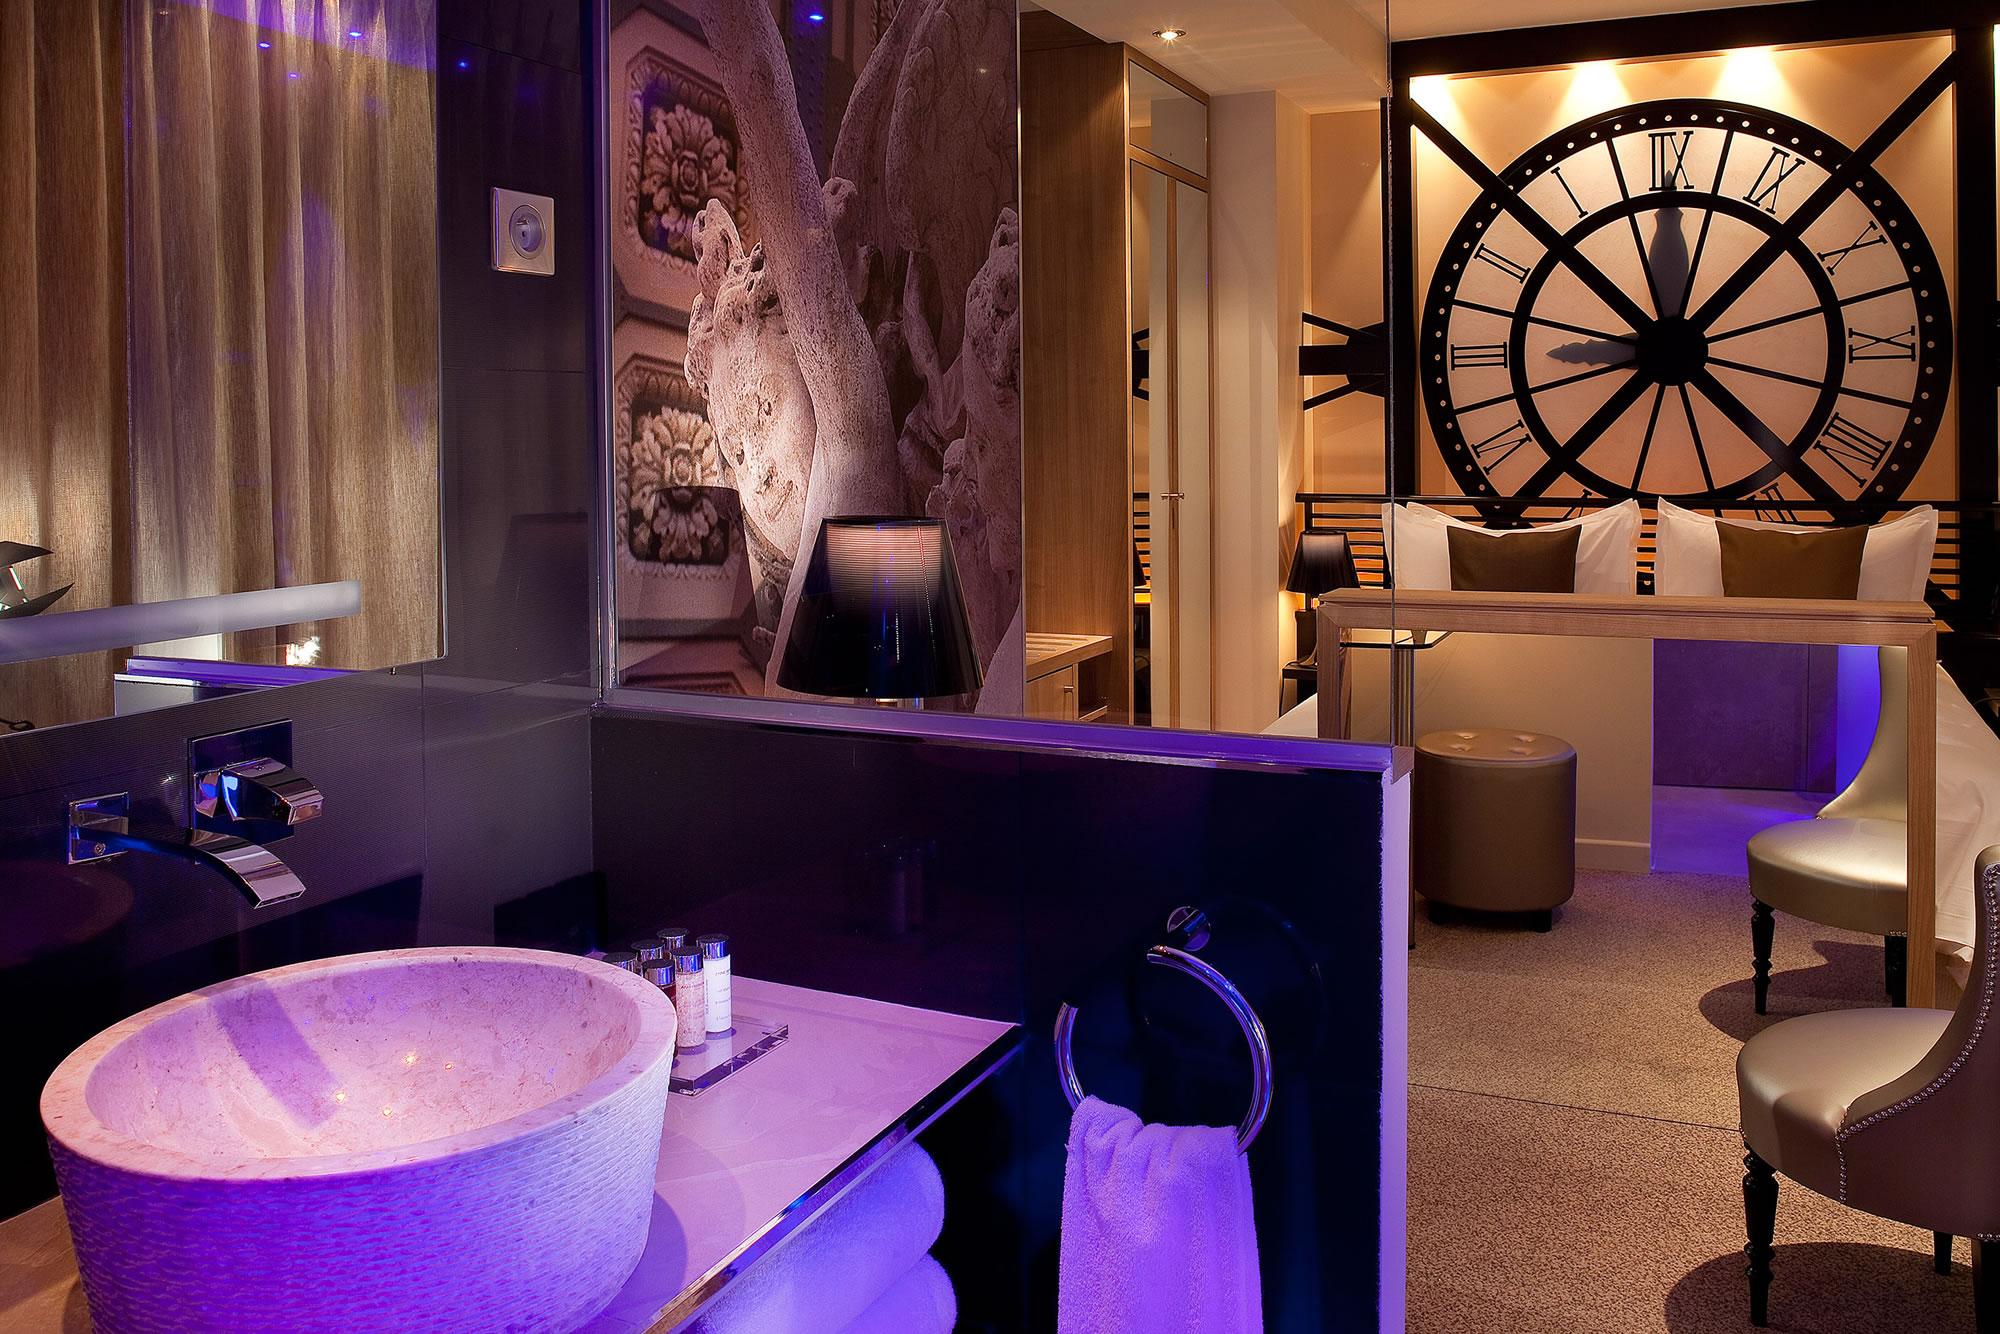 Chambre Musee Orsay - Hotel Design Secret de Paris